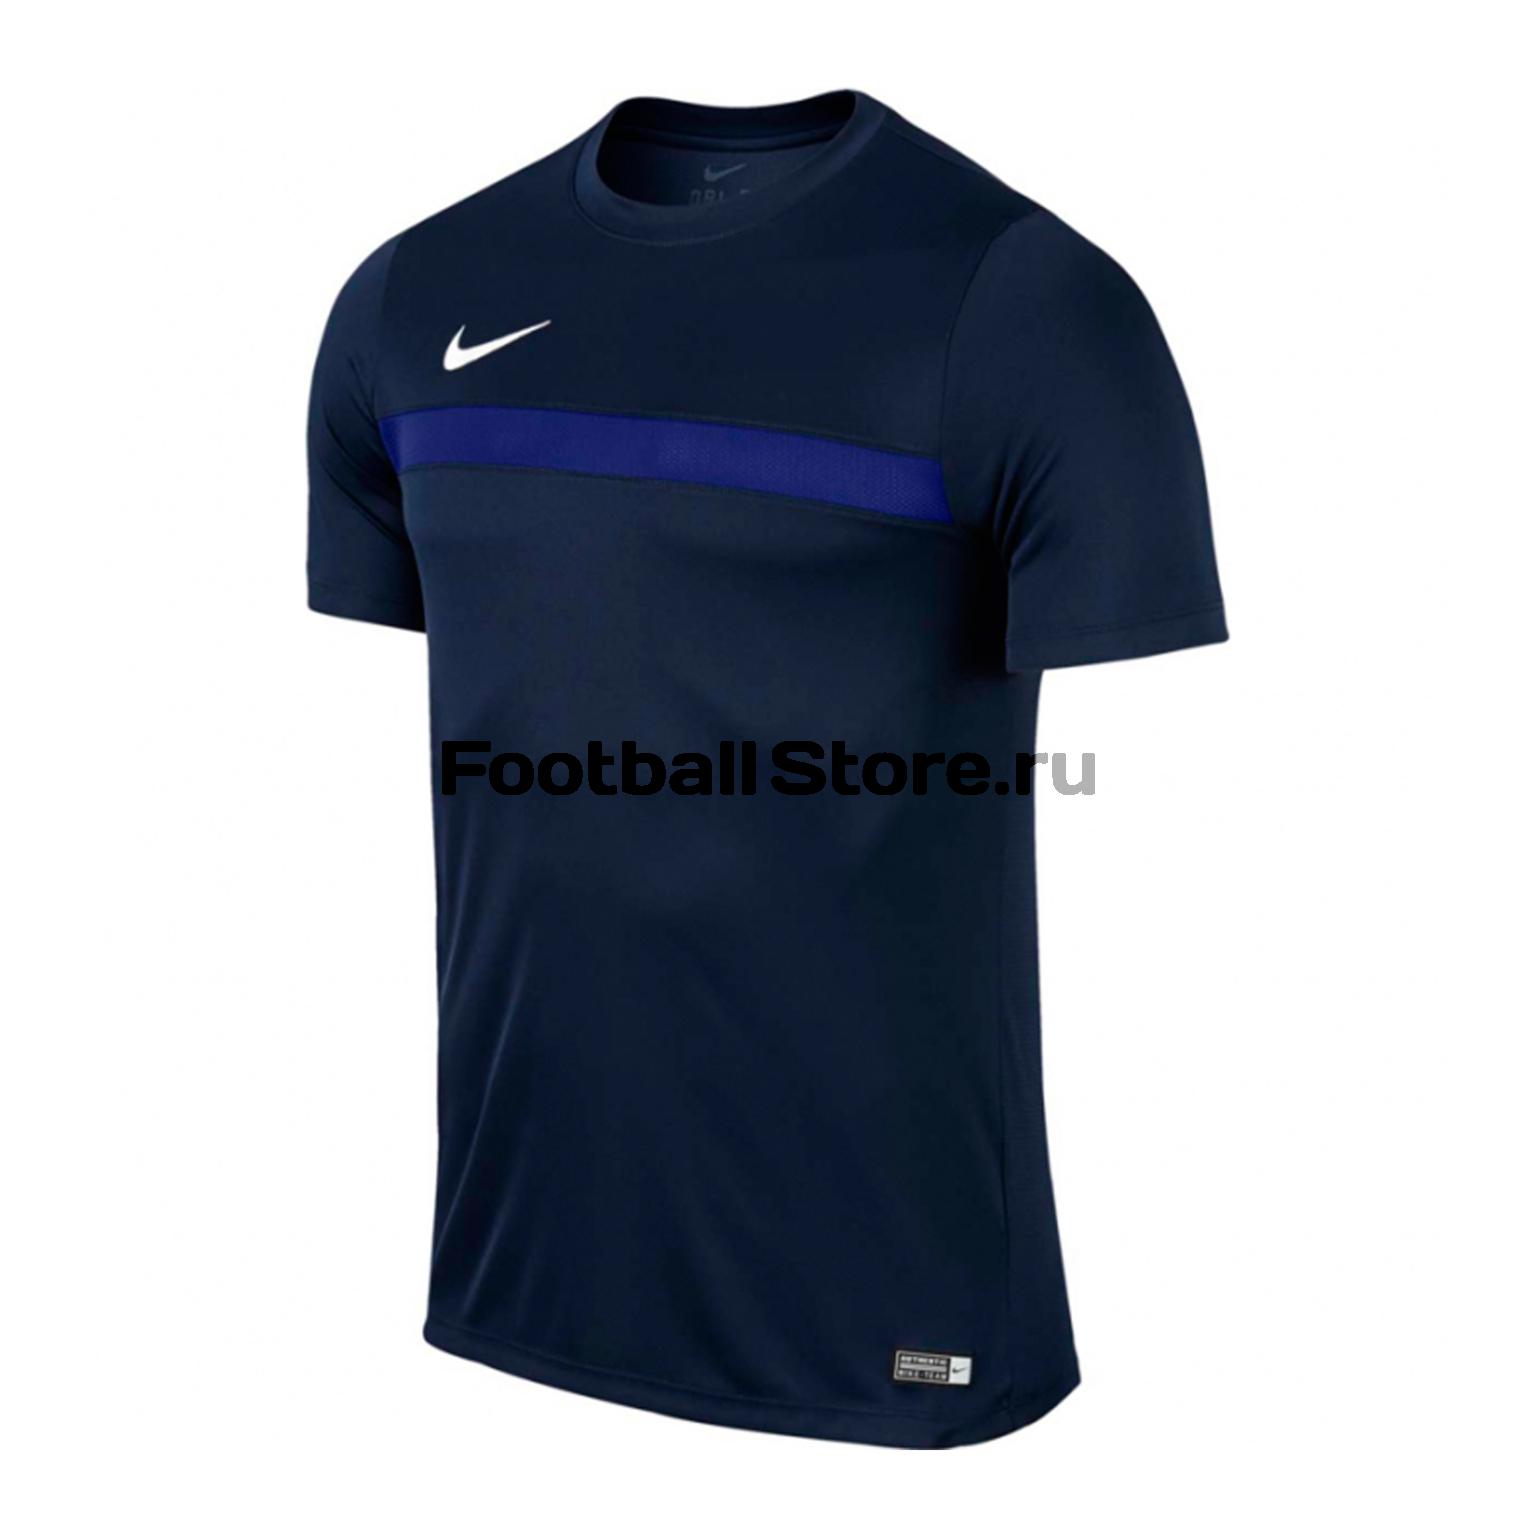 Футболка тренировочная Nike Academy SS Top JR 726008-451 nike футболка для мальчика nike df cool ss top yth nike